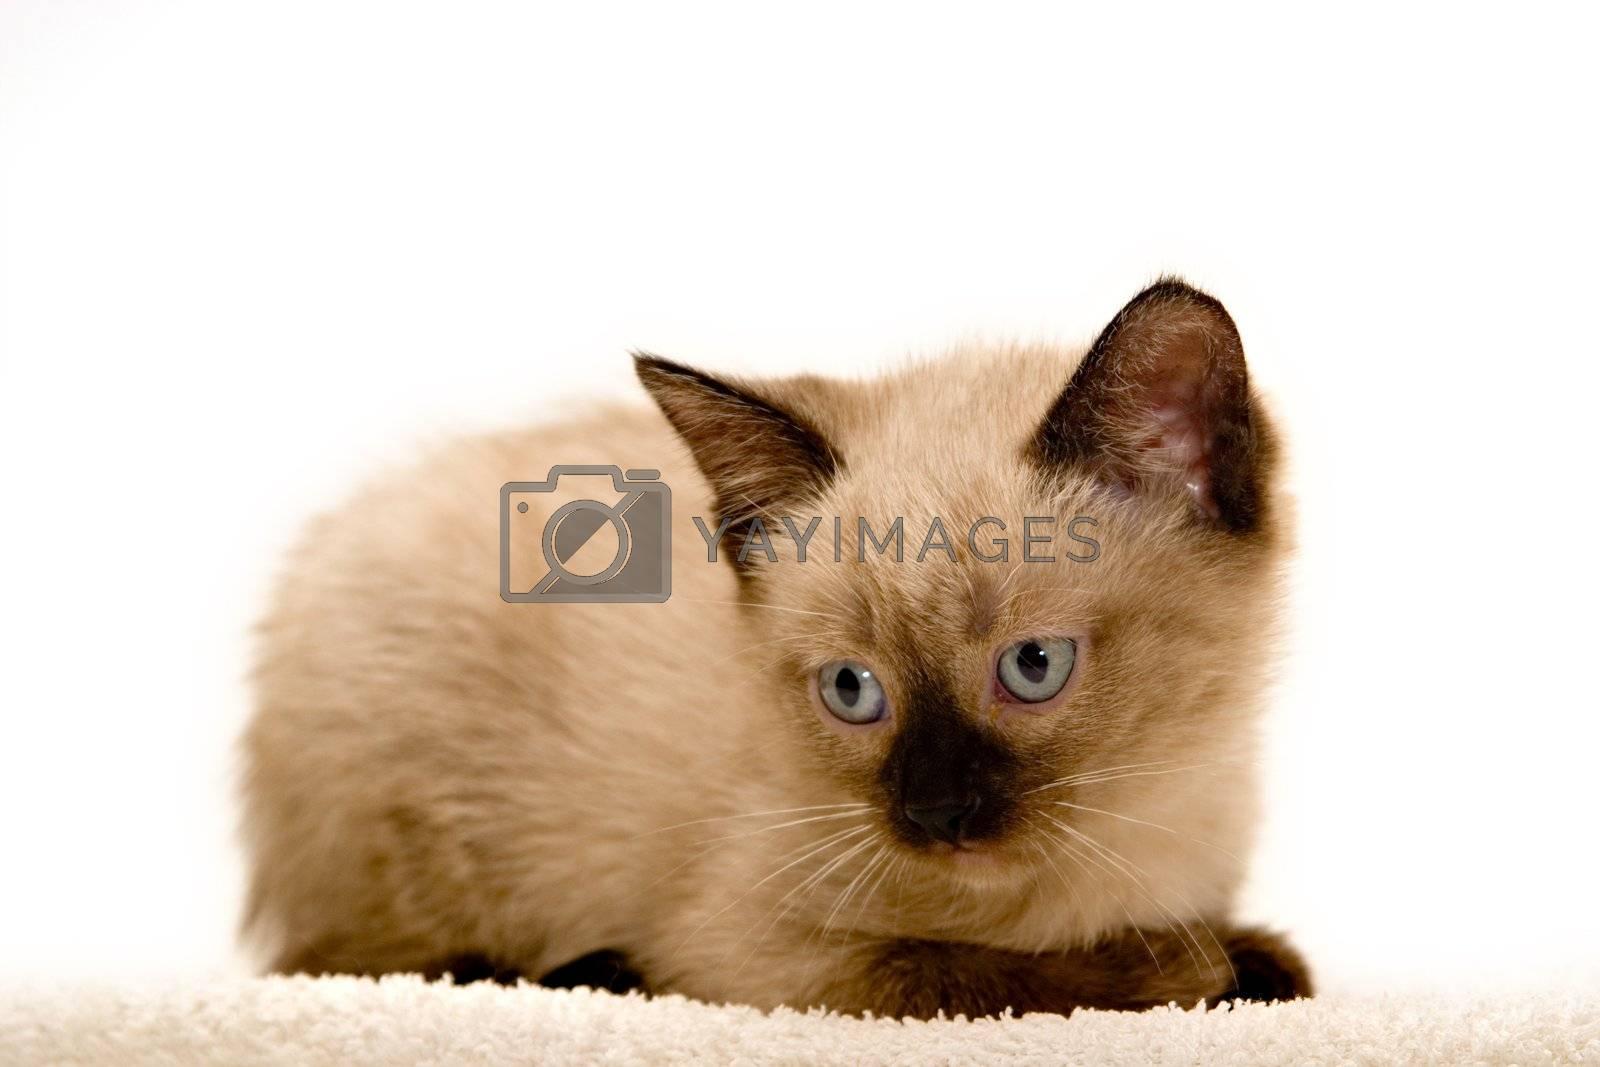 Small kitten, lying down, on white background.